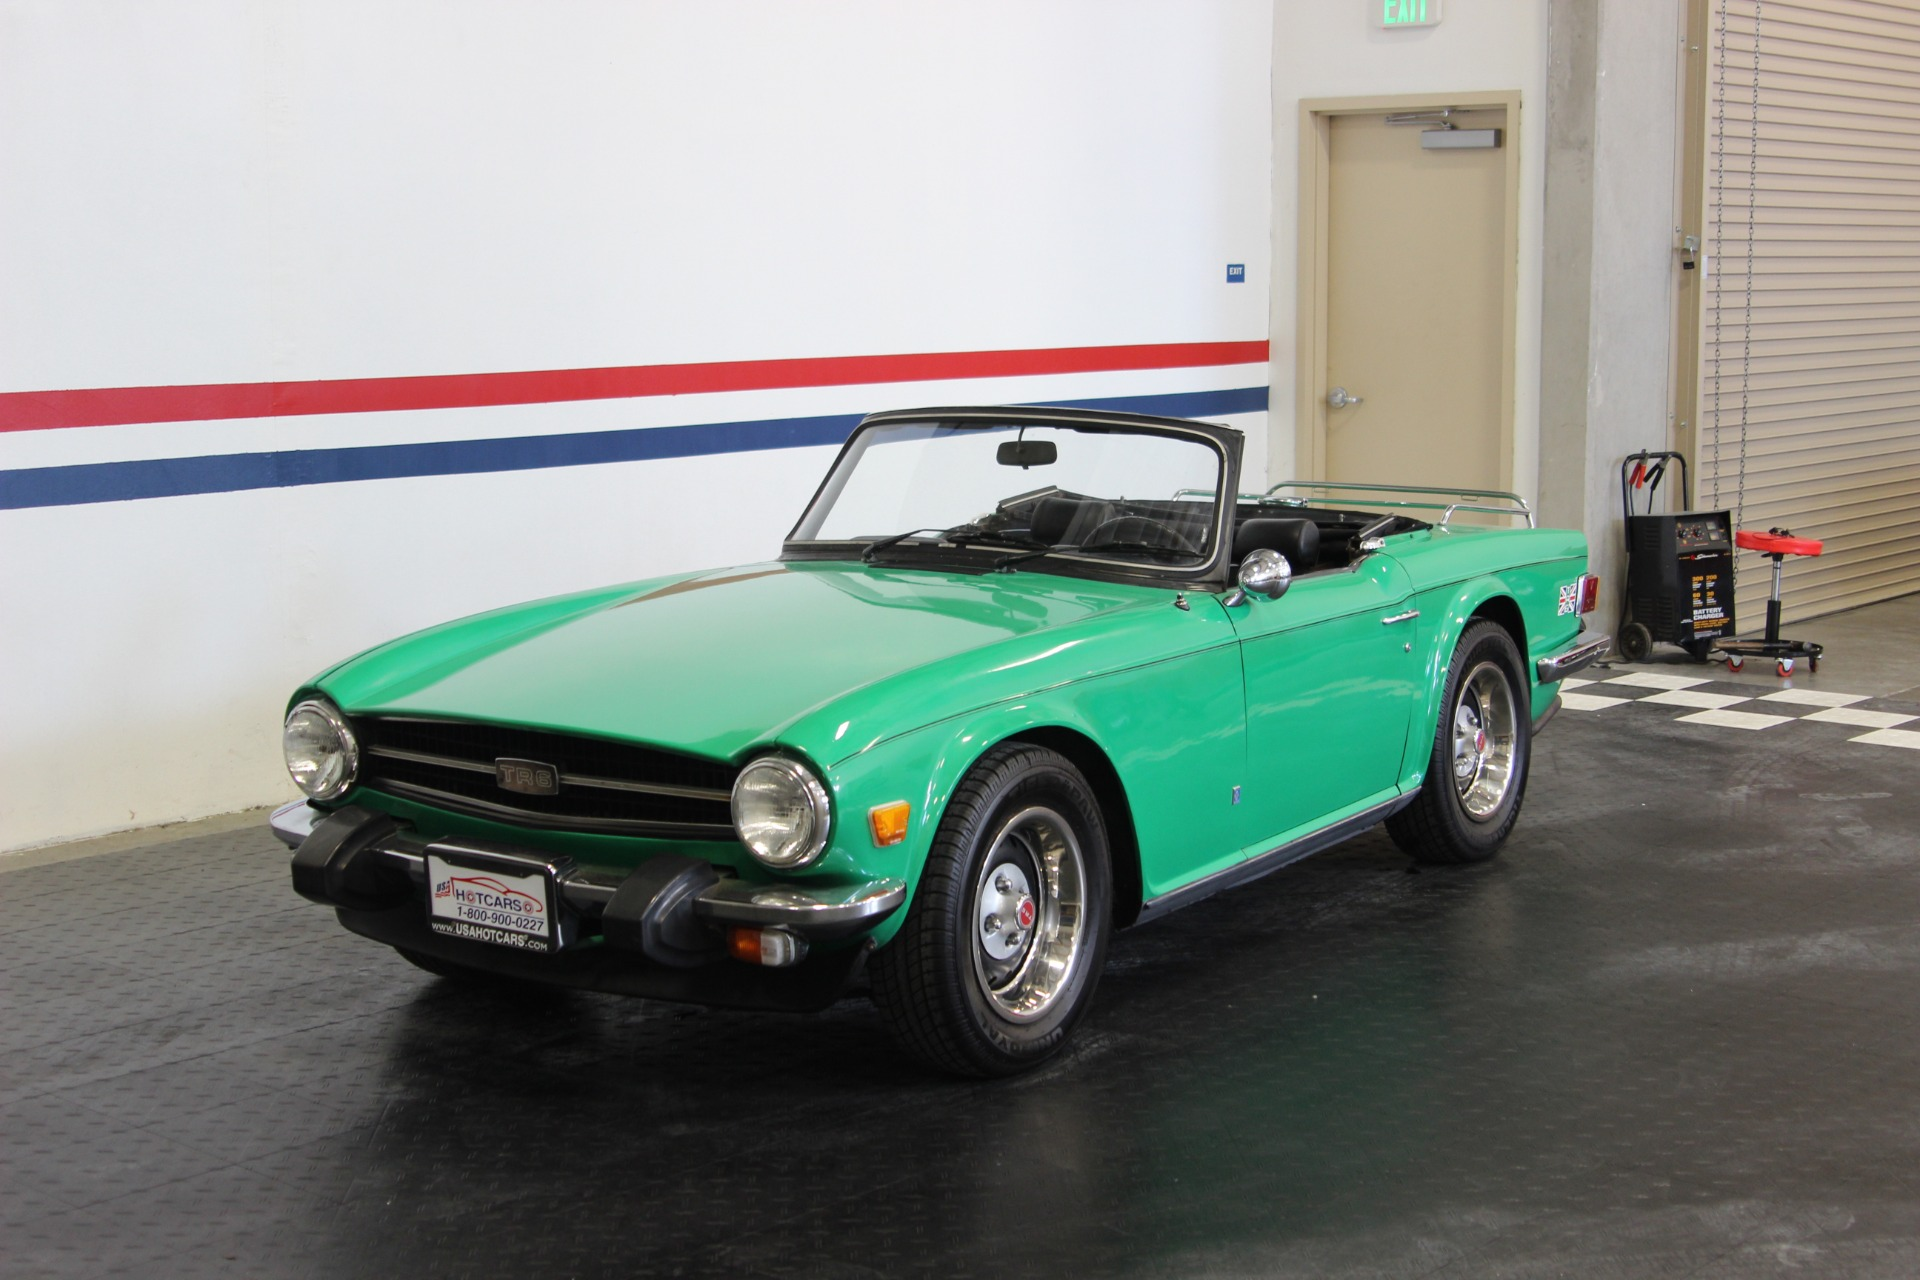 Used-1975-Triumph-TR6